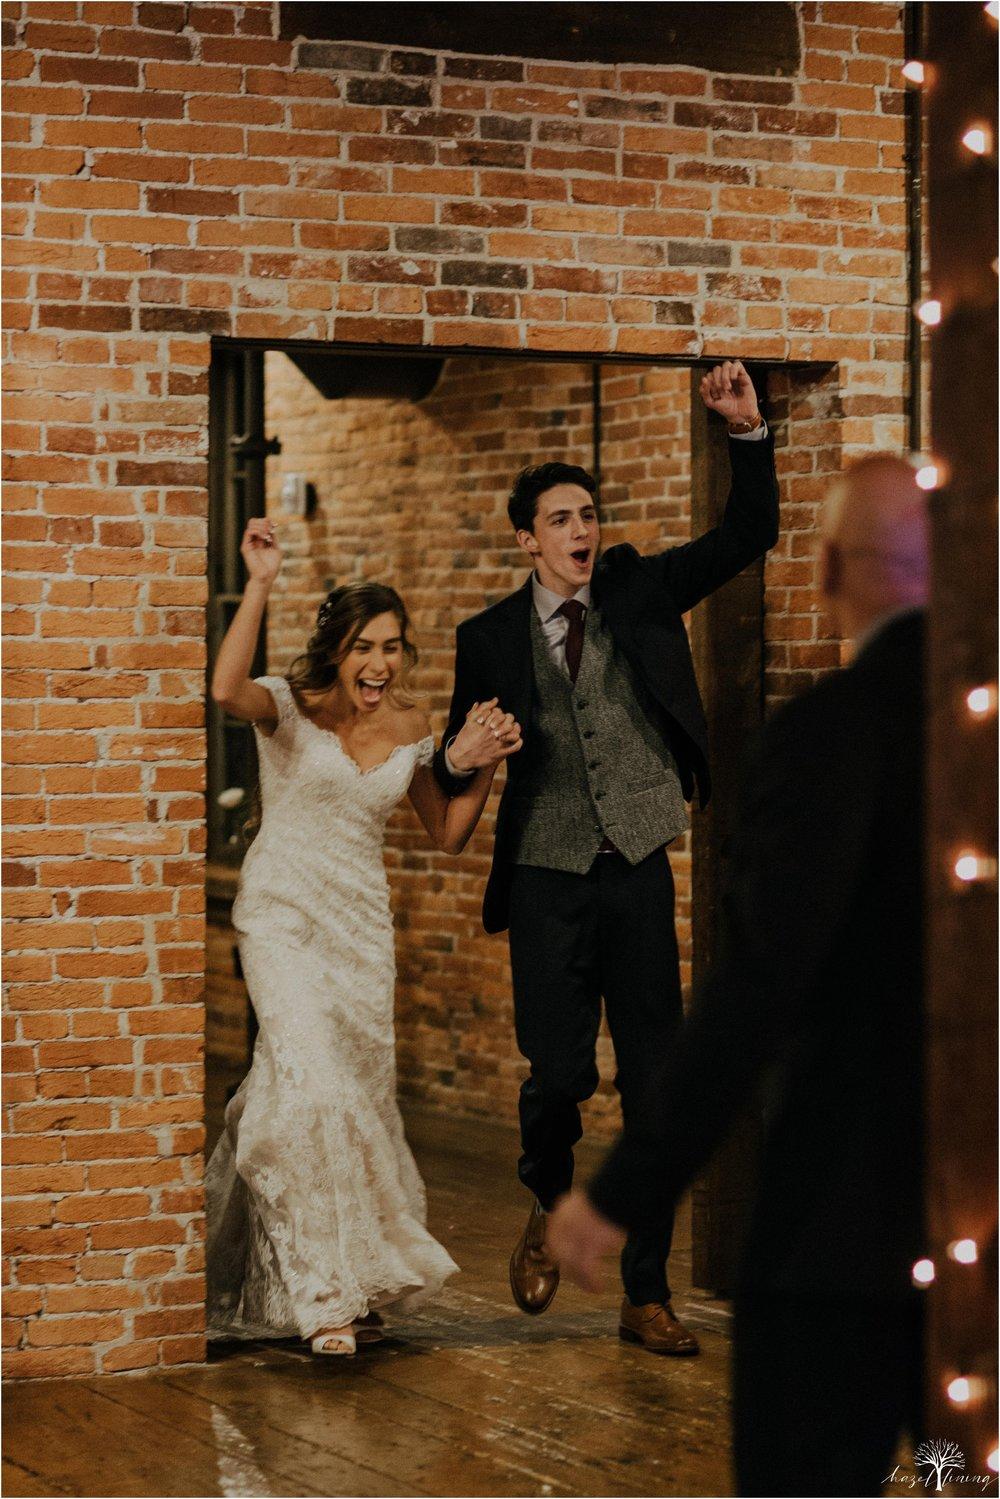 emma-matt-gehringer-the-booking-house-lancaster-manhiem-pennsylvania-winter-wedding_0137.jpg